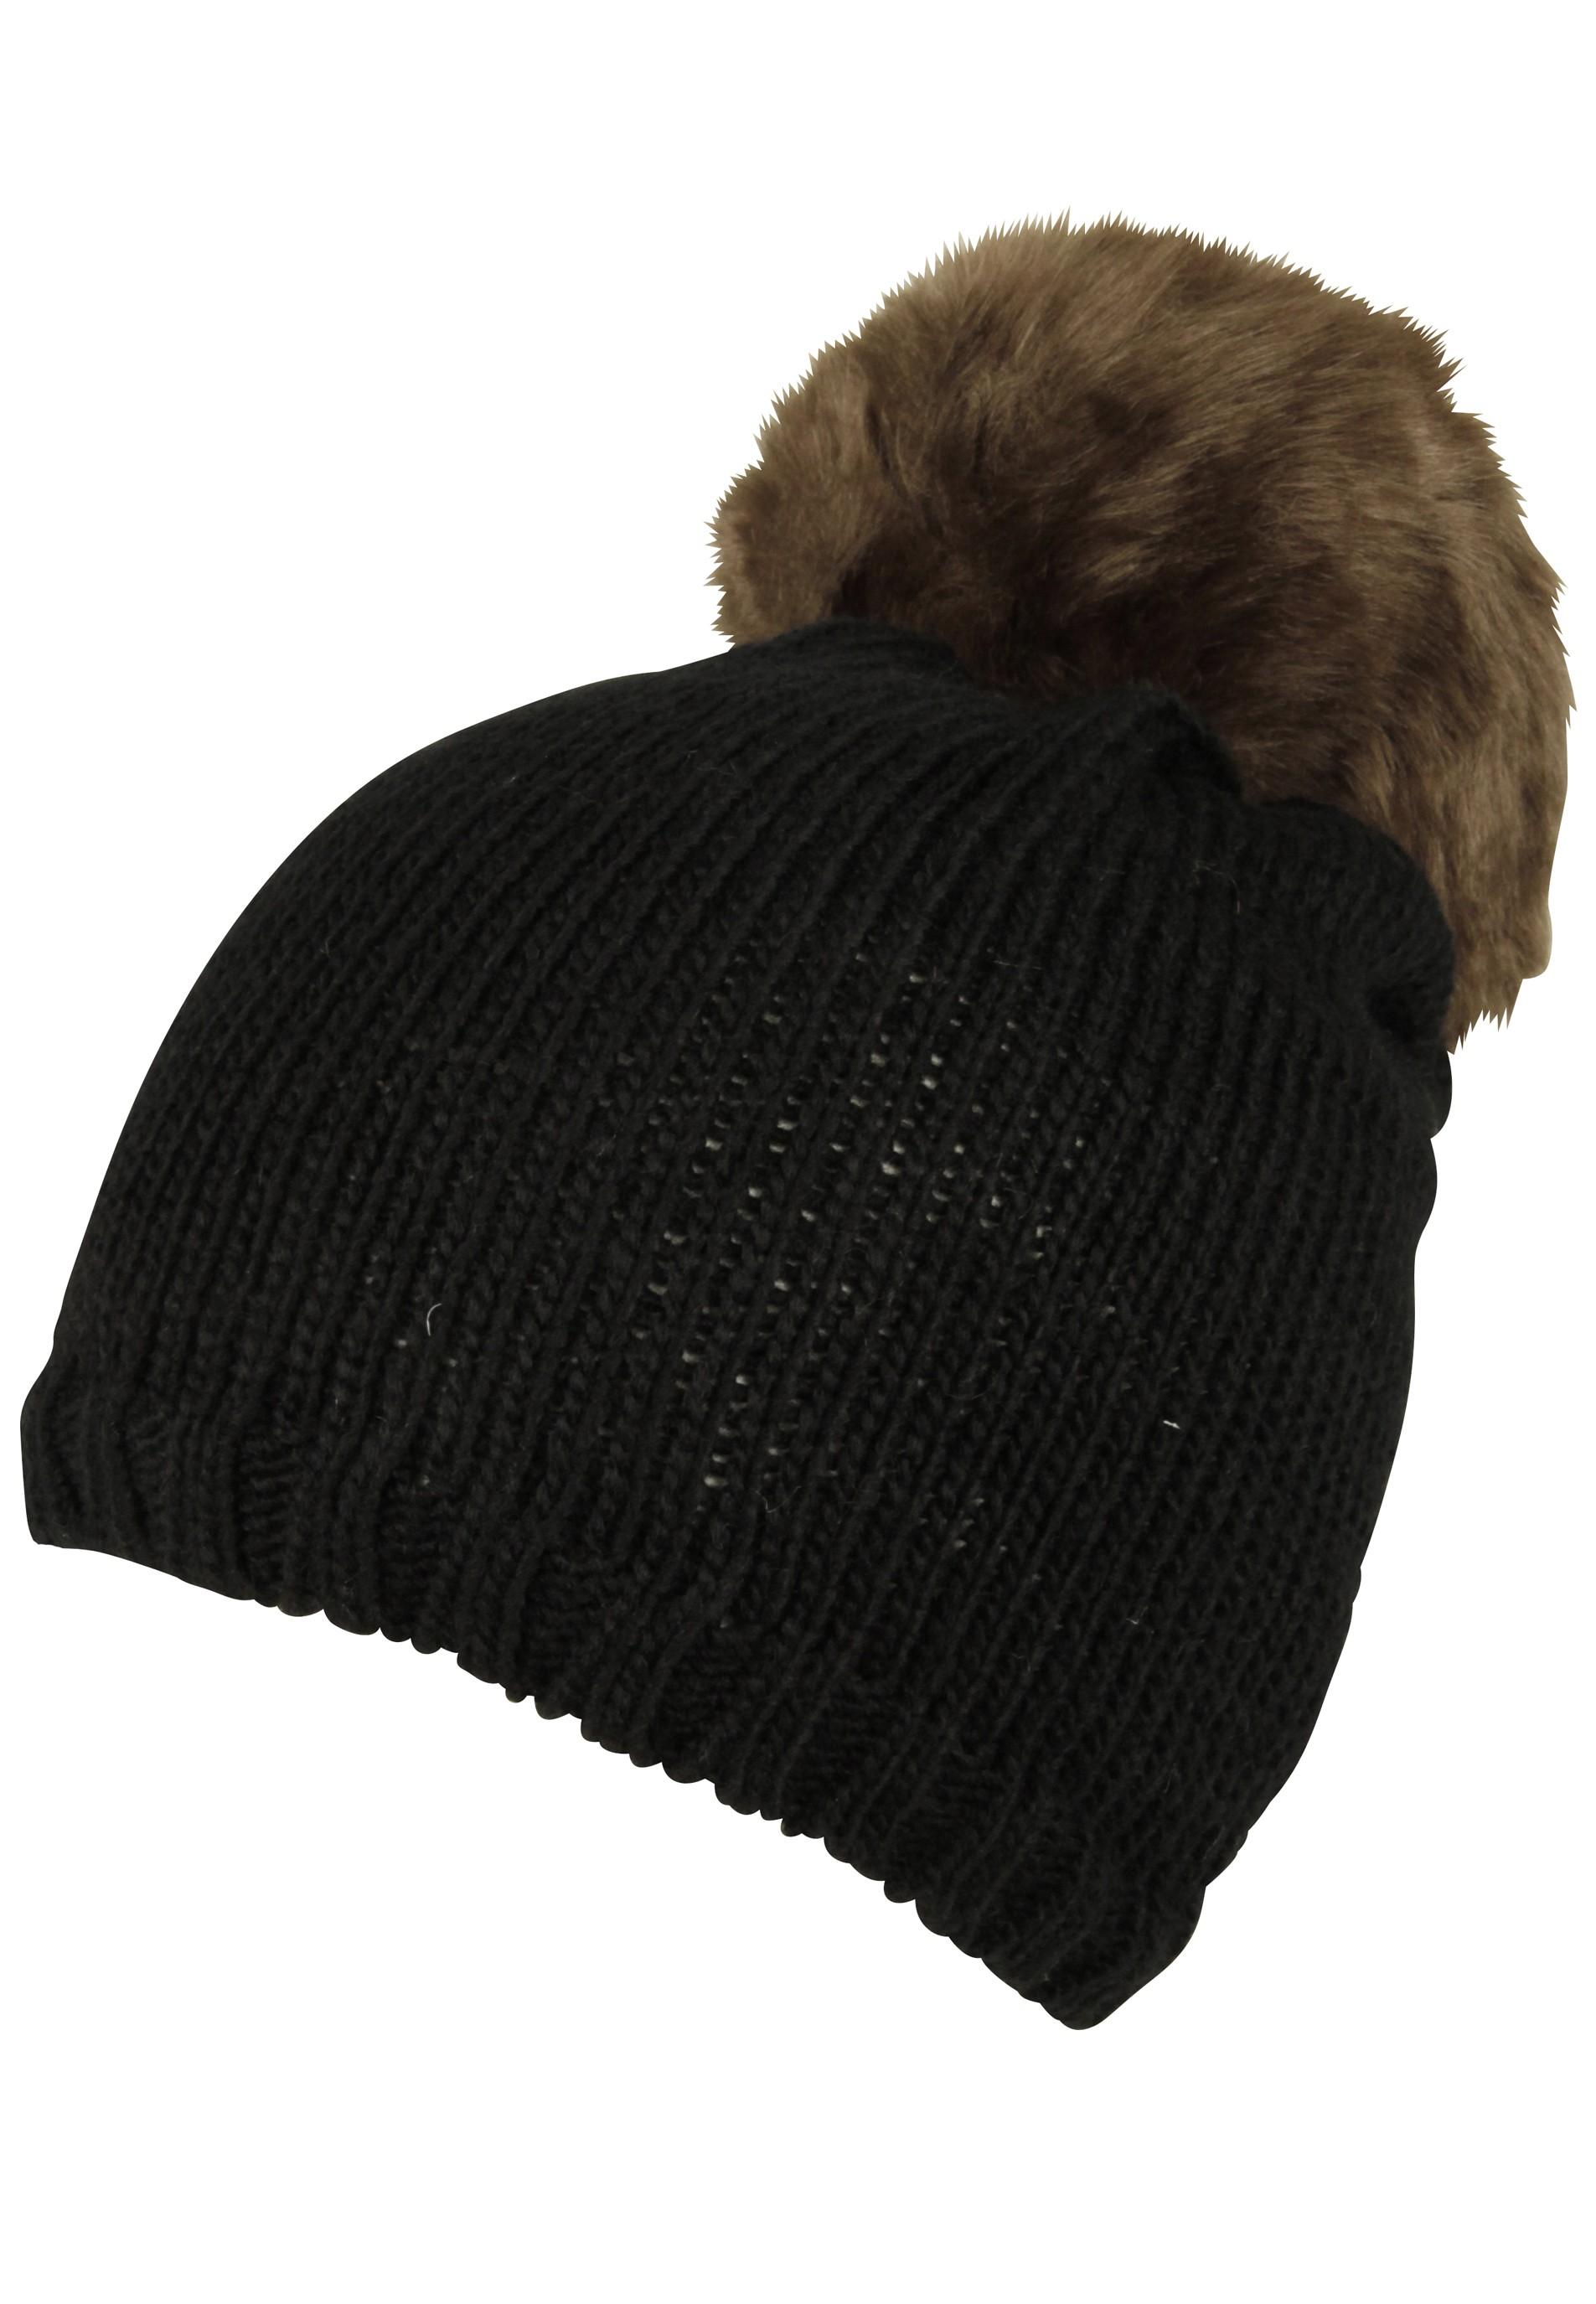 Wintermütze mit weichem Fellimitat